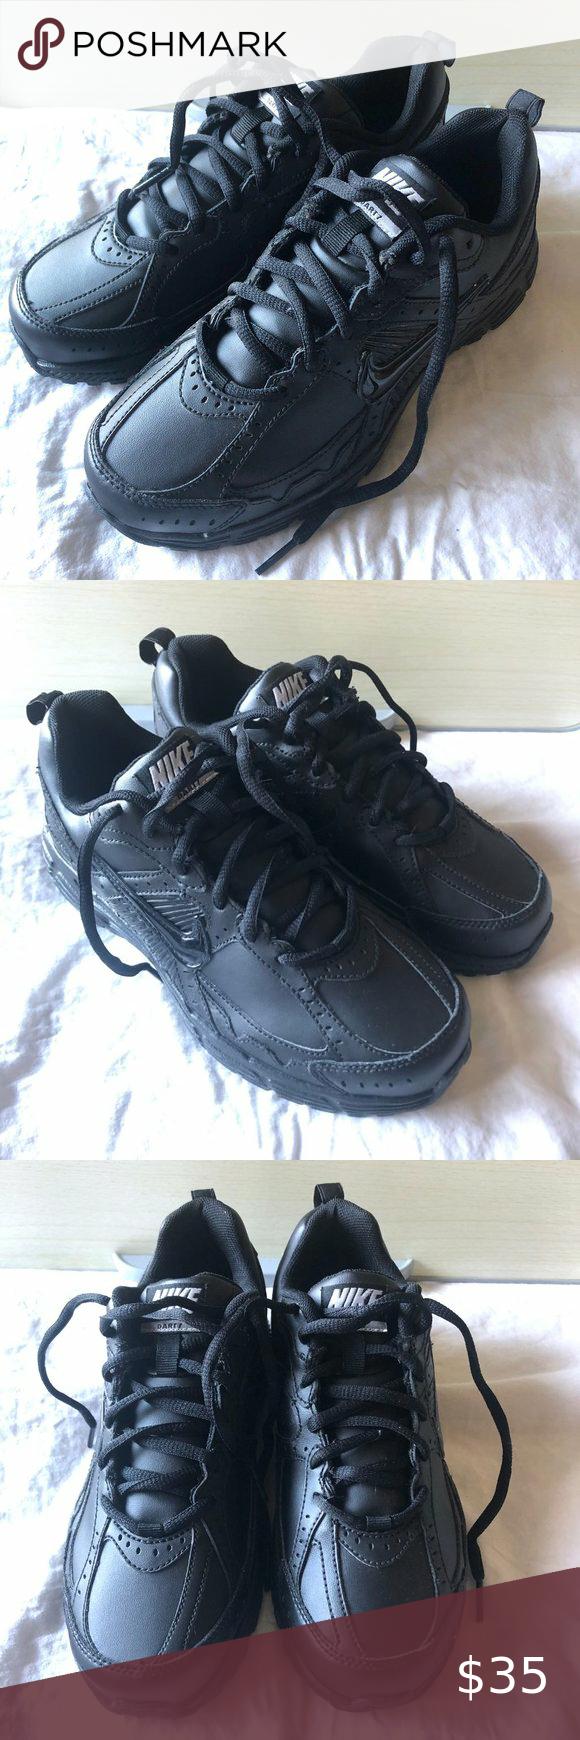 Nike Dart 7 All Black Running Sneakers